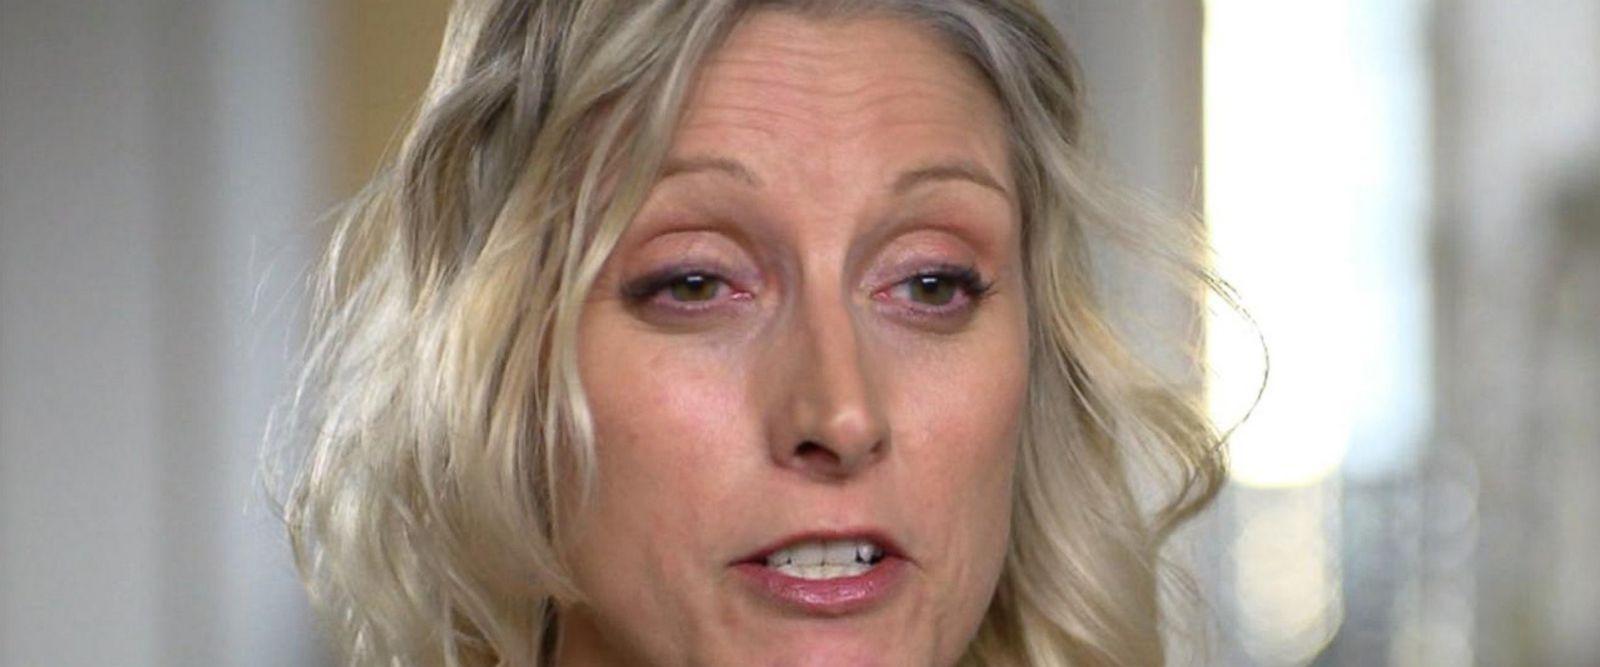 VIDEO: Multiple women describe alleged encounters with Harvey Weinstein: Part 1